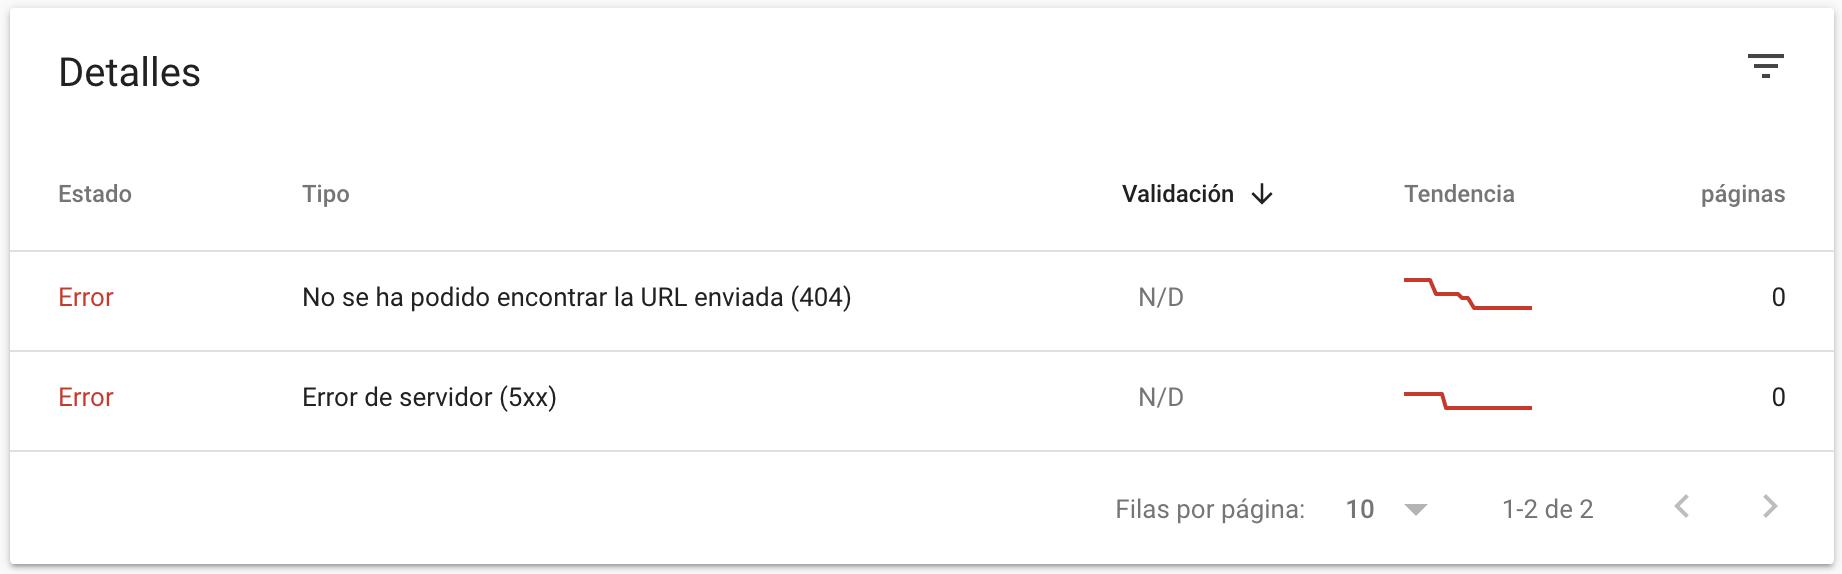 Google Search Console detalles cobertura